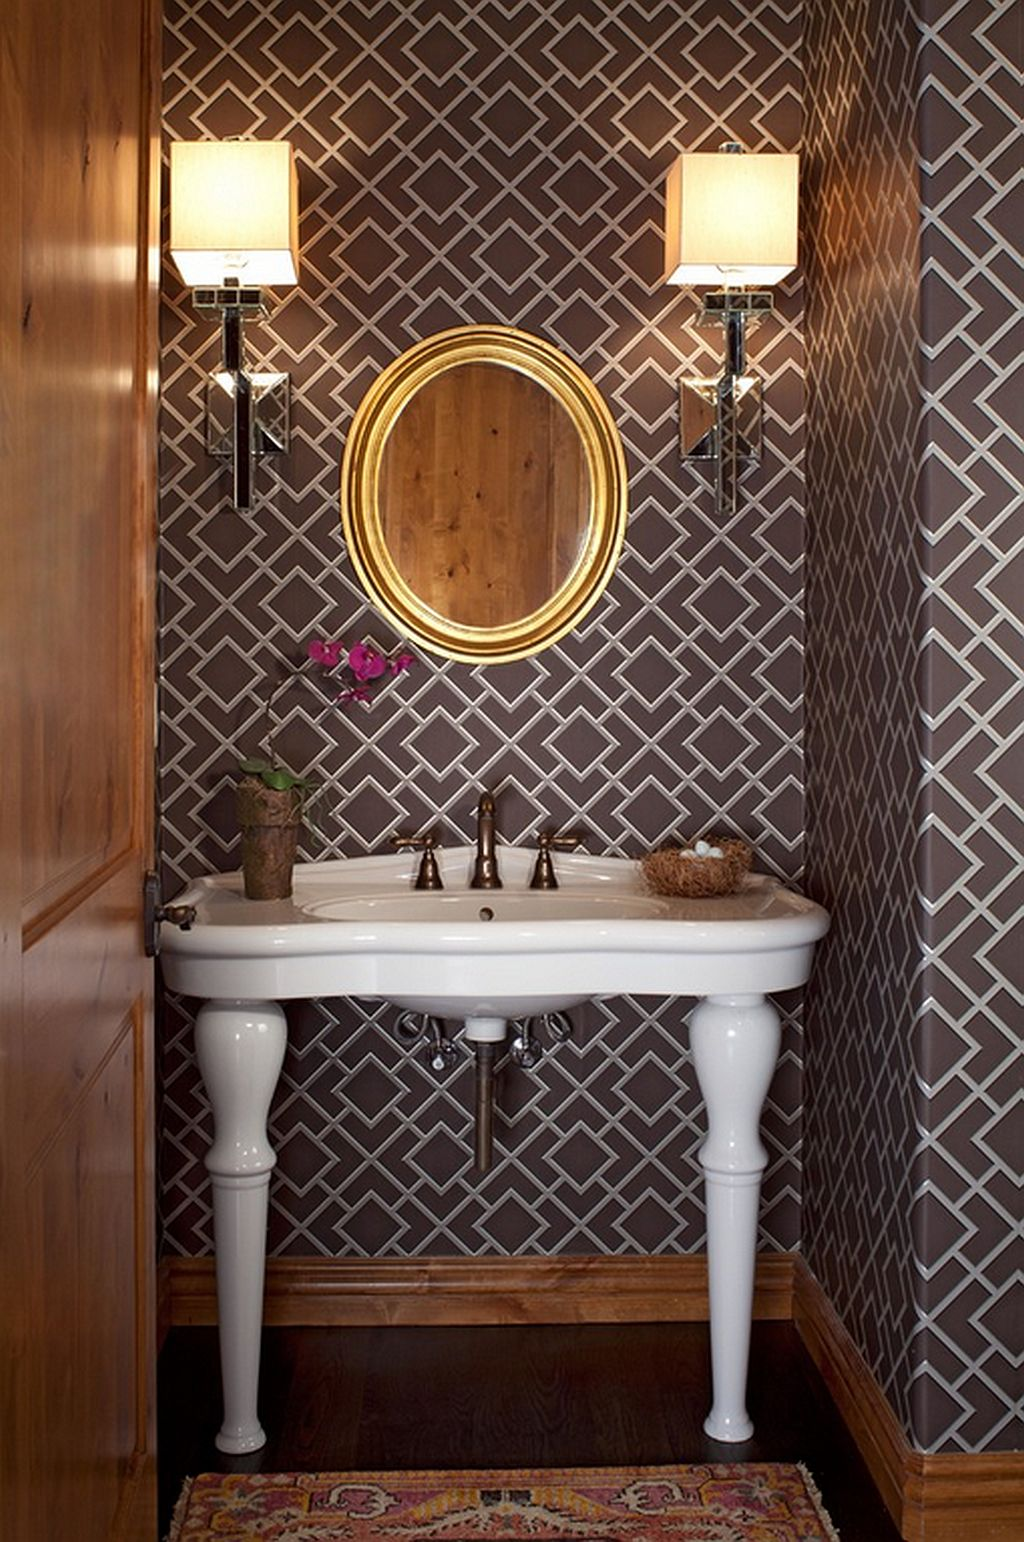 adelaparvu.com casa rustic clasica designer Andrea Schumacher (9)